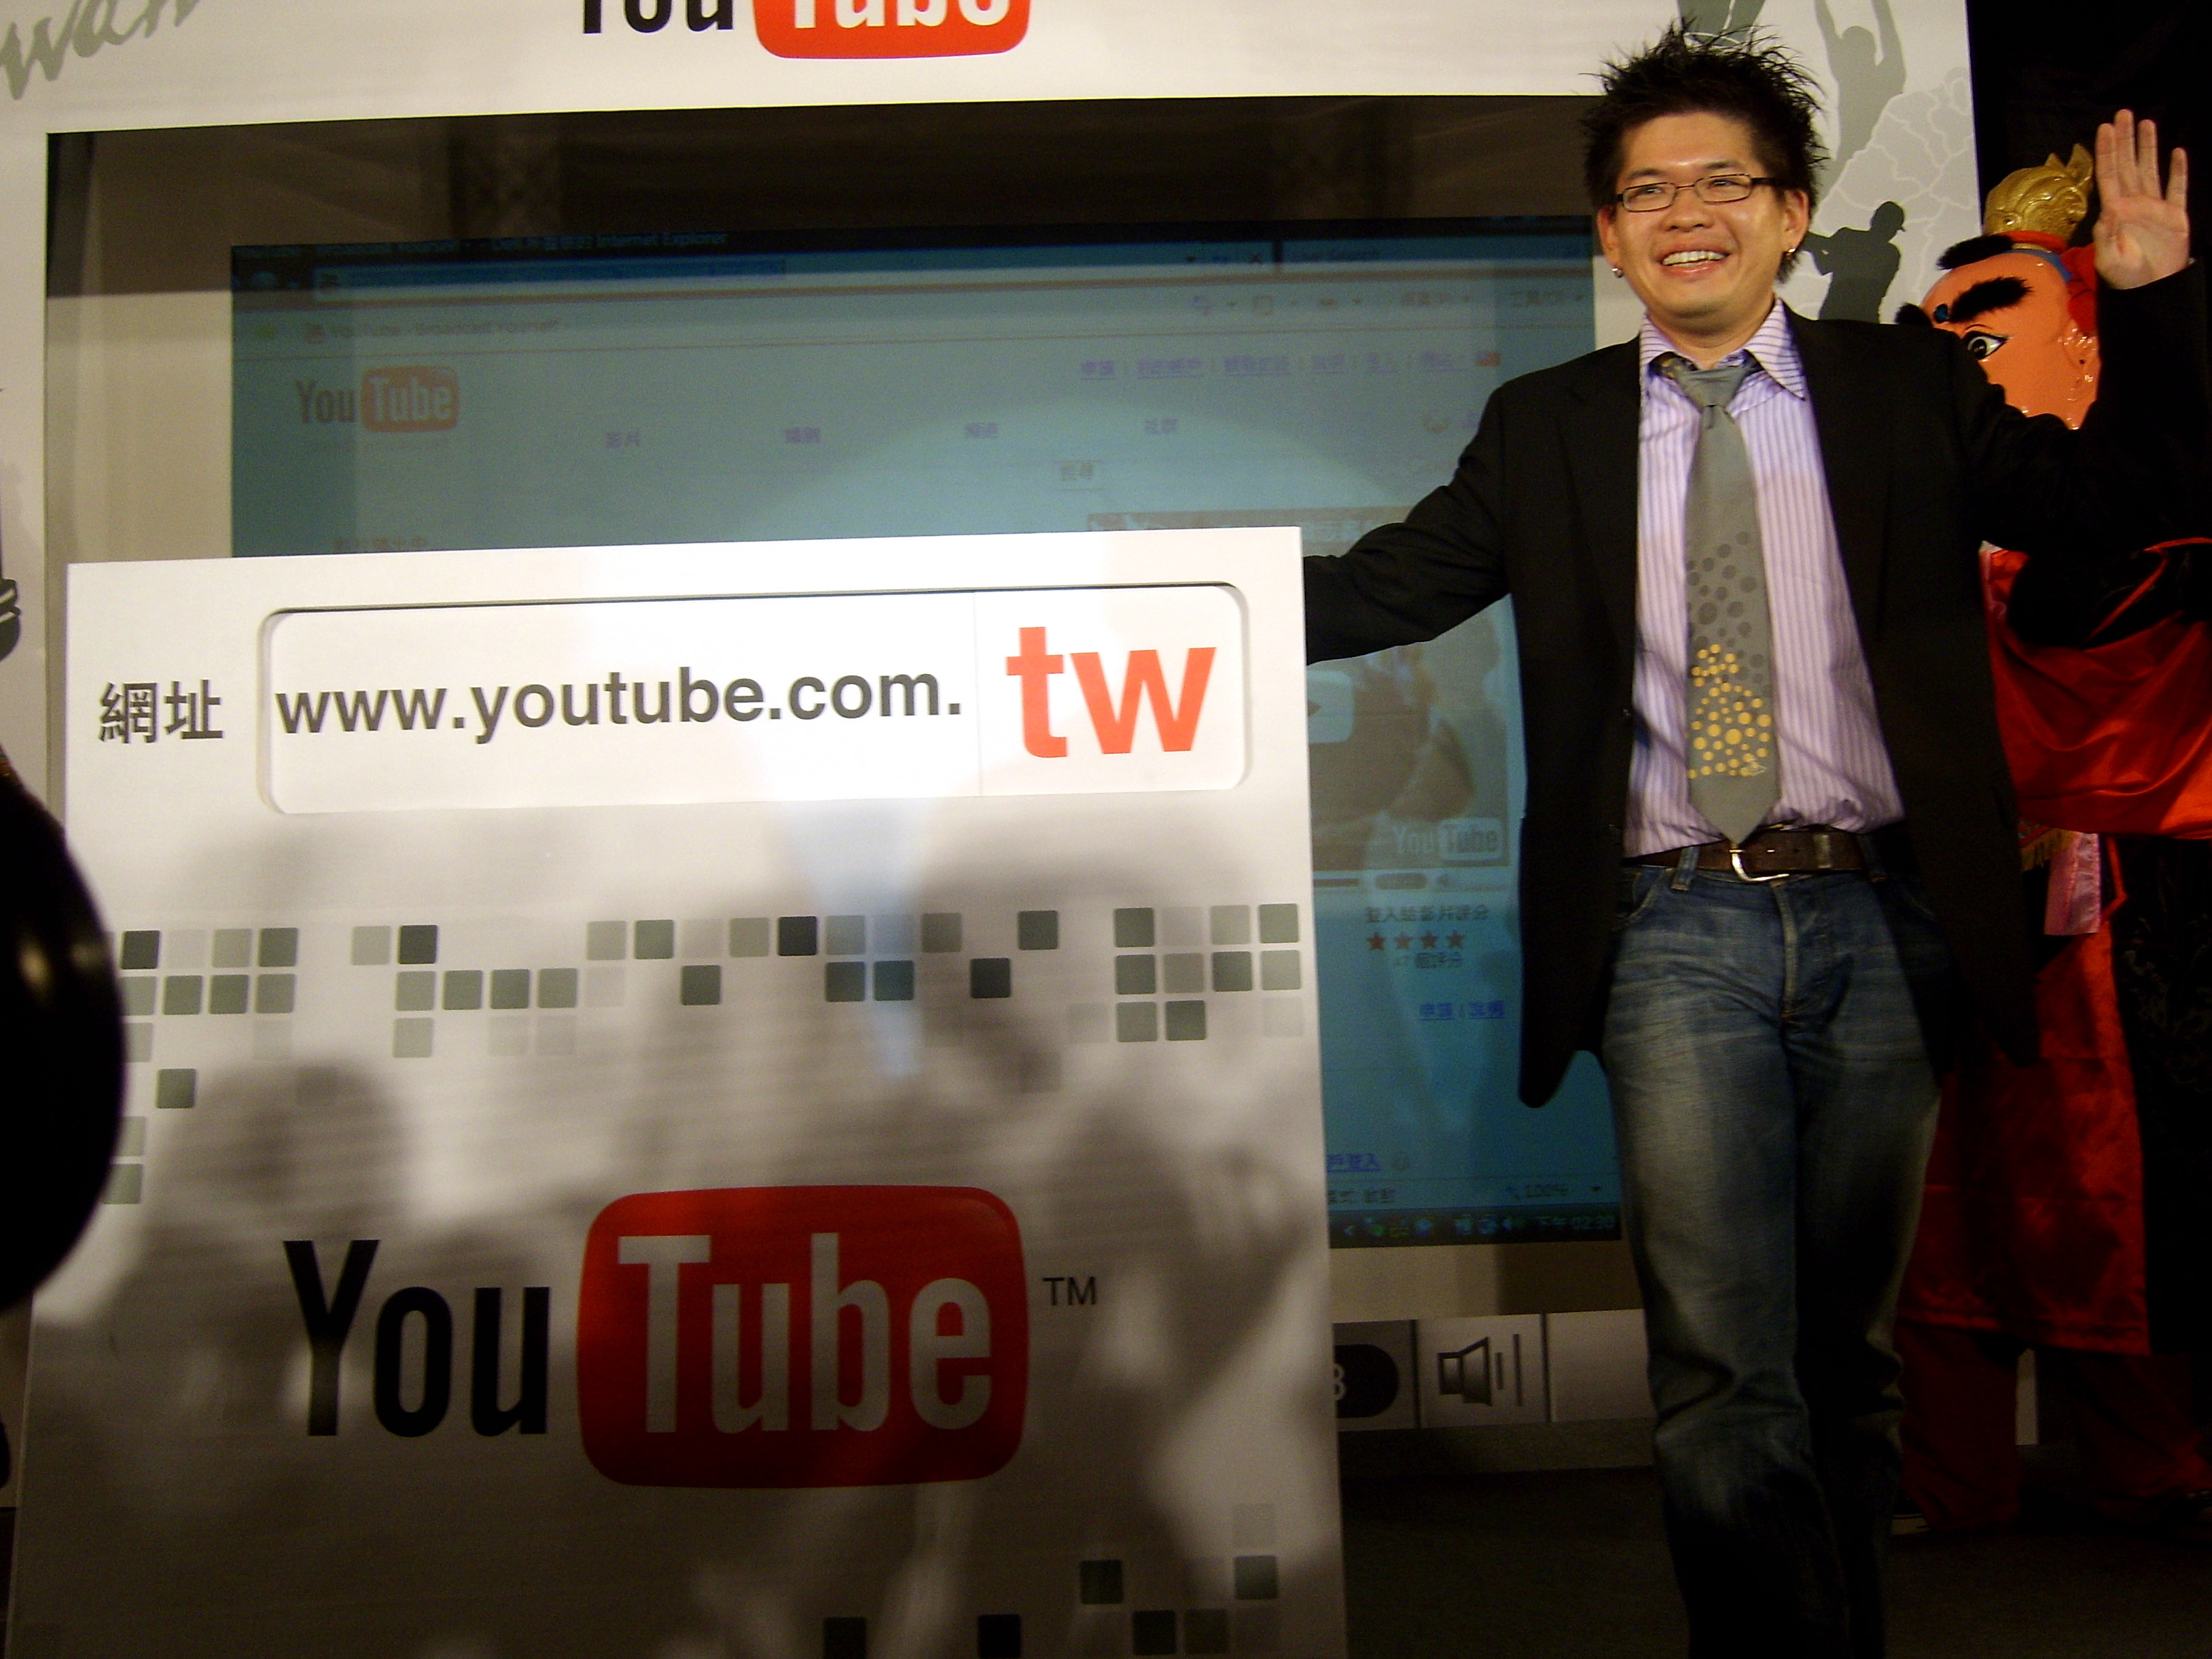 Steve Chen is an American entrepreneur